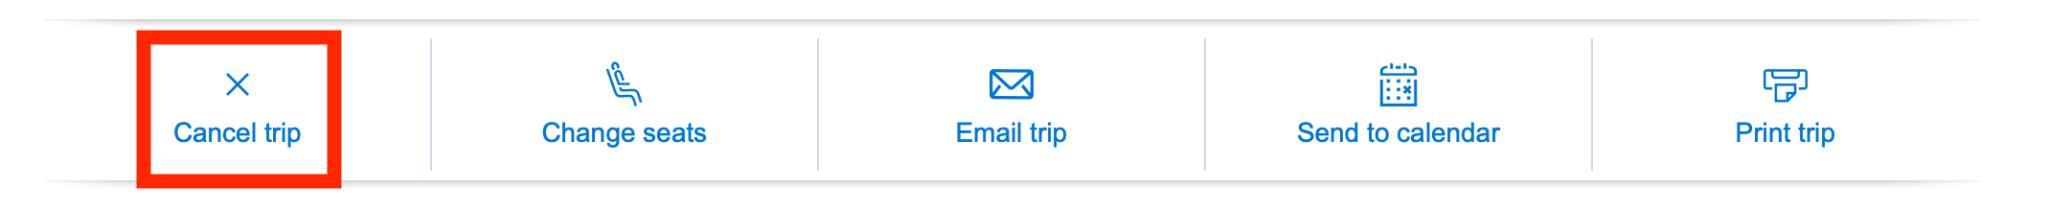 Cancel trip button screenshot on AA.com